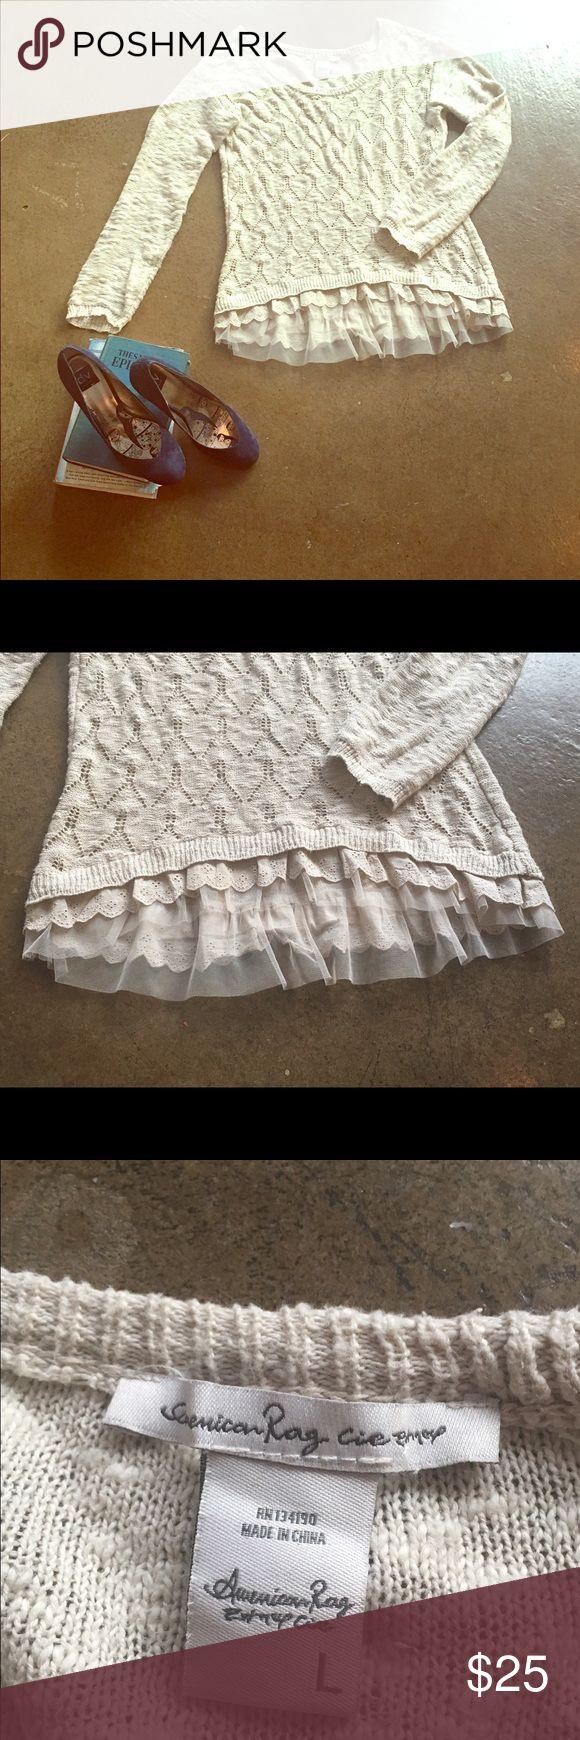 American Rag Shirt Fun boho inspired American Rag shirt. Cream colored lace adds an elegant detail making your look chic and classy. American Rag Tops Sweatshirts & Hoodies